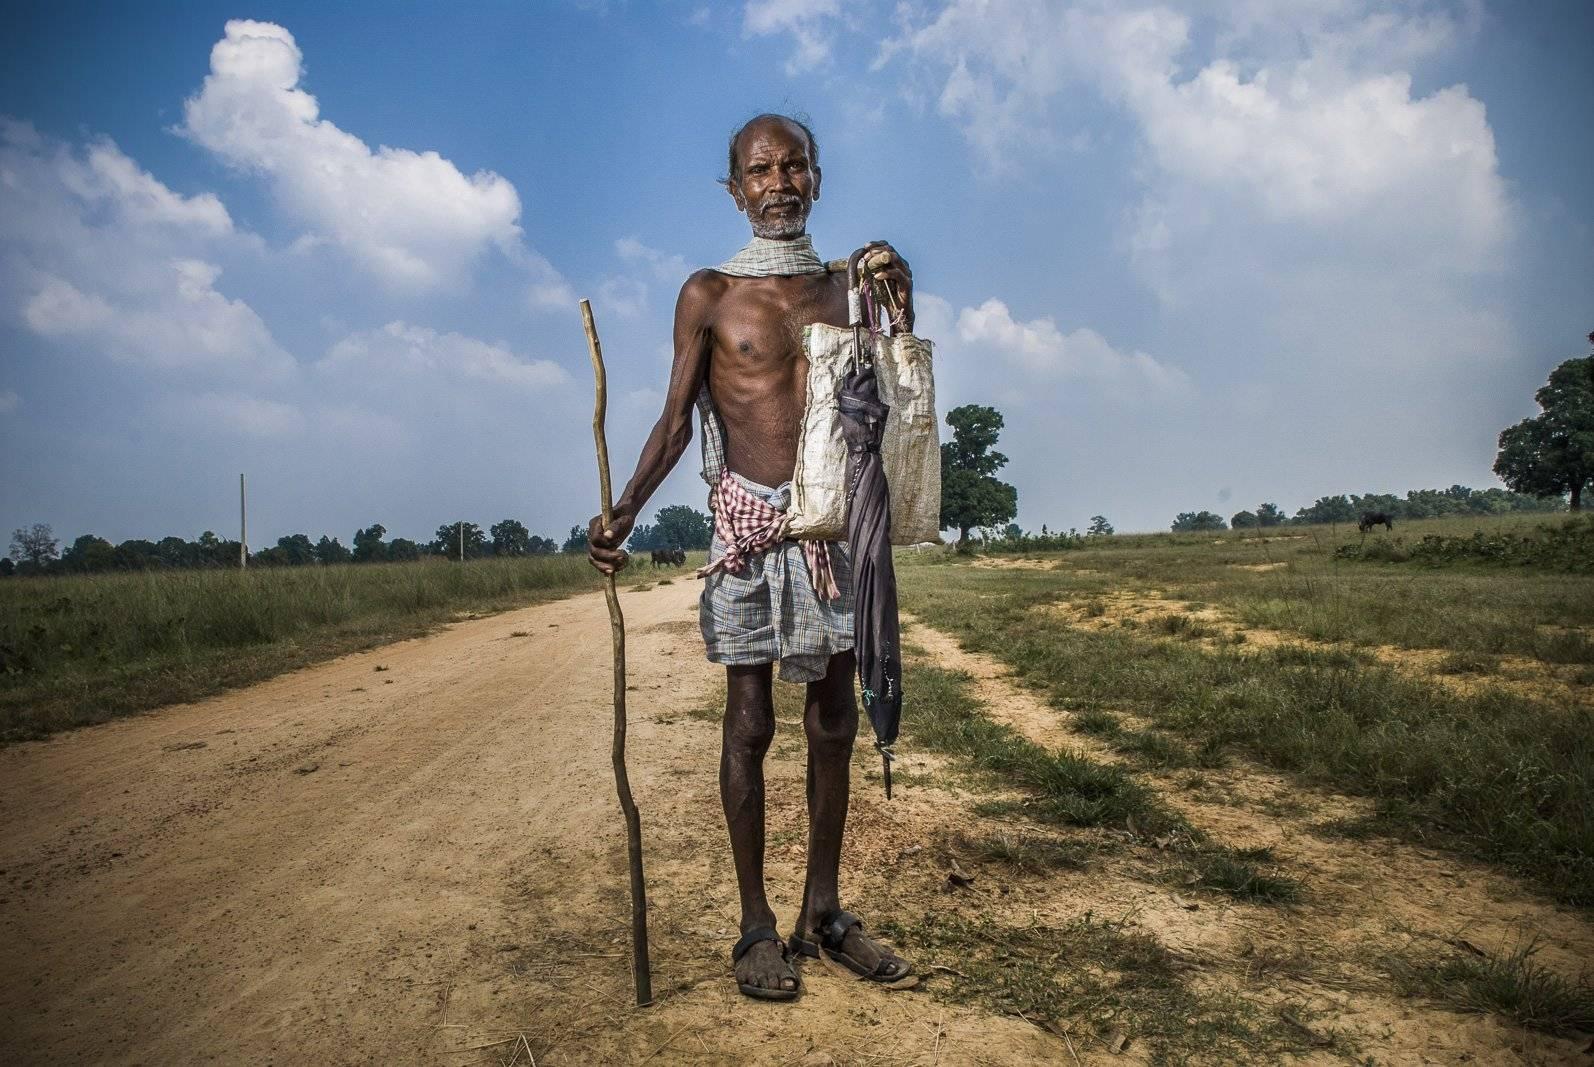 NGO photographer in India